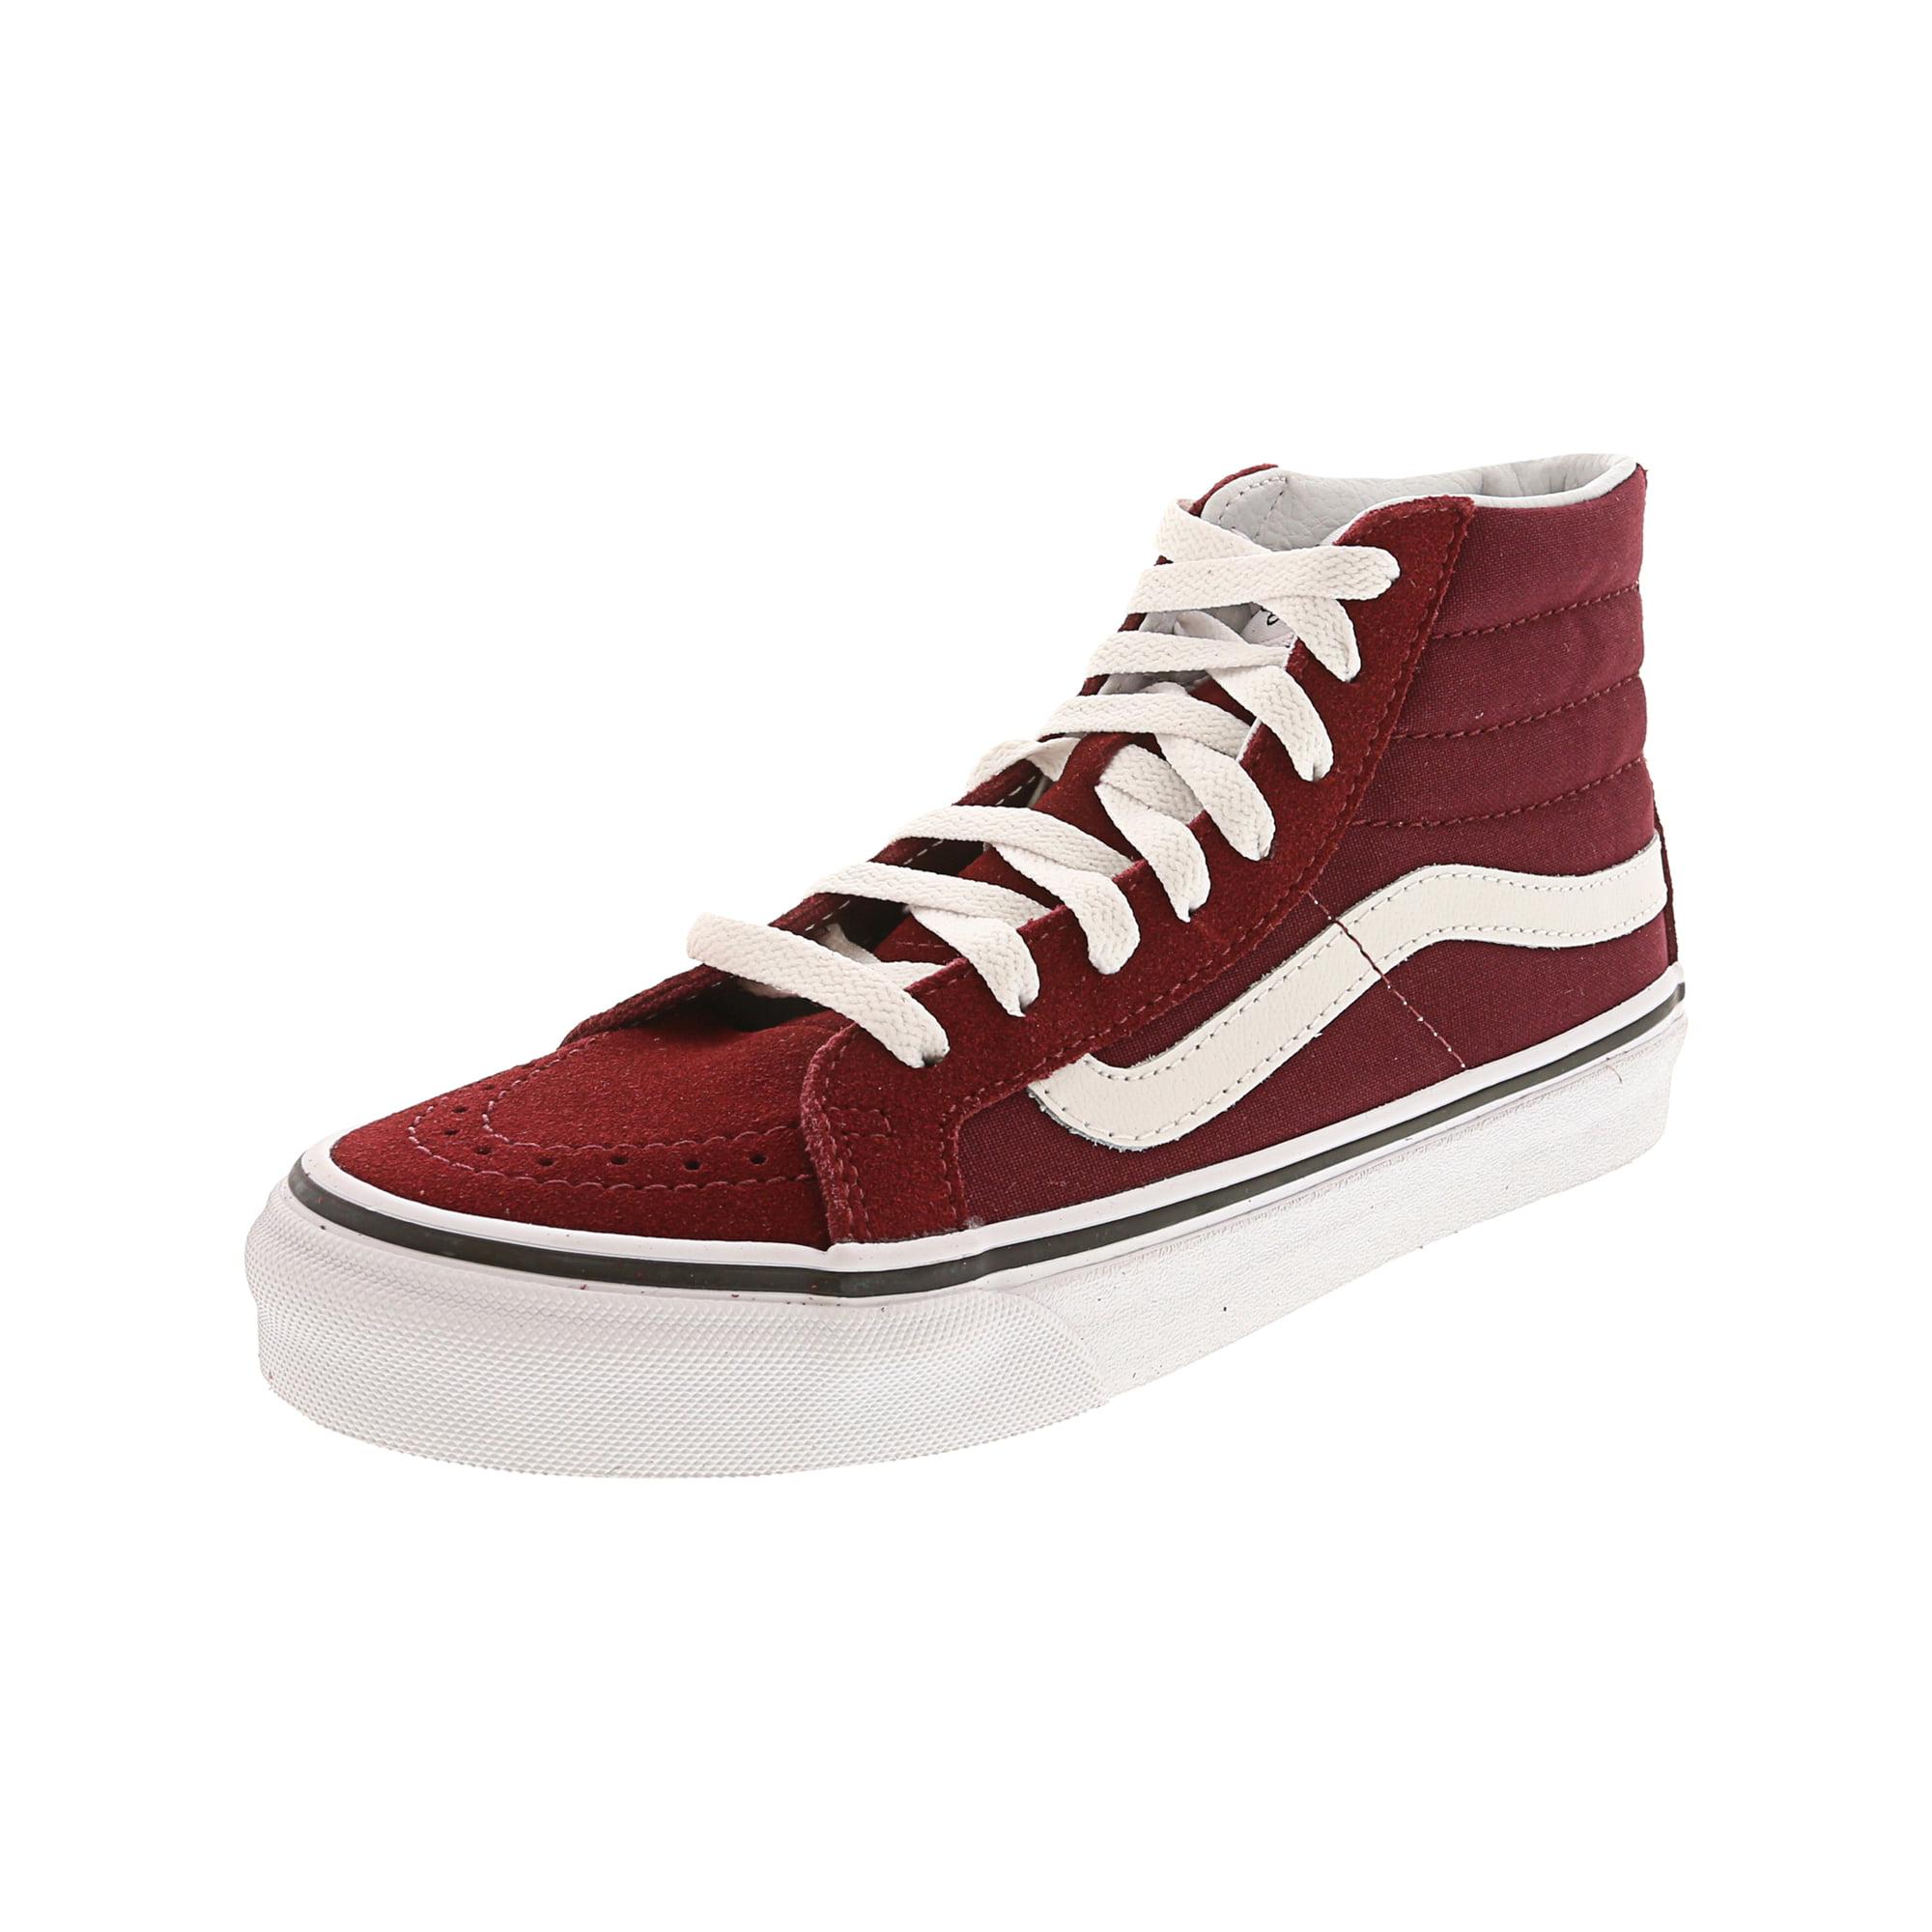 aeb147c232 Vans Sk8-Hi Slim Pirate Black   True White Ankle-High Canvas Skateboarding  Shoe - 8M 6.5M